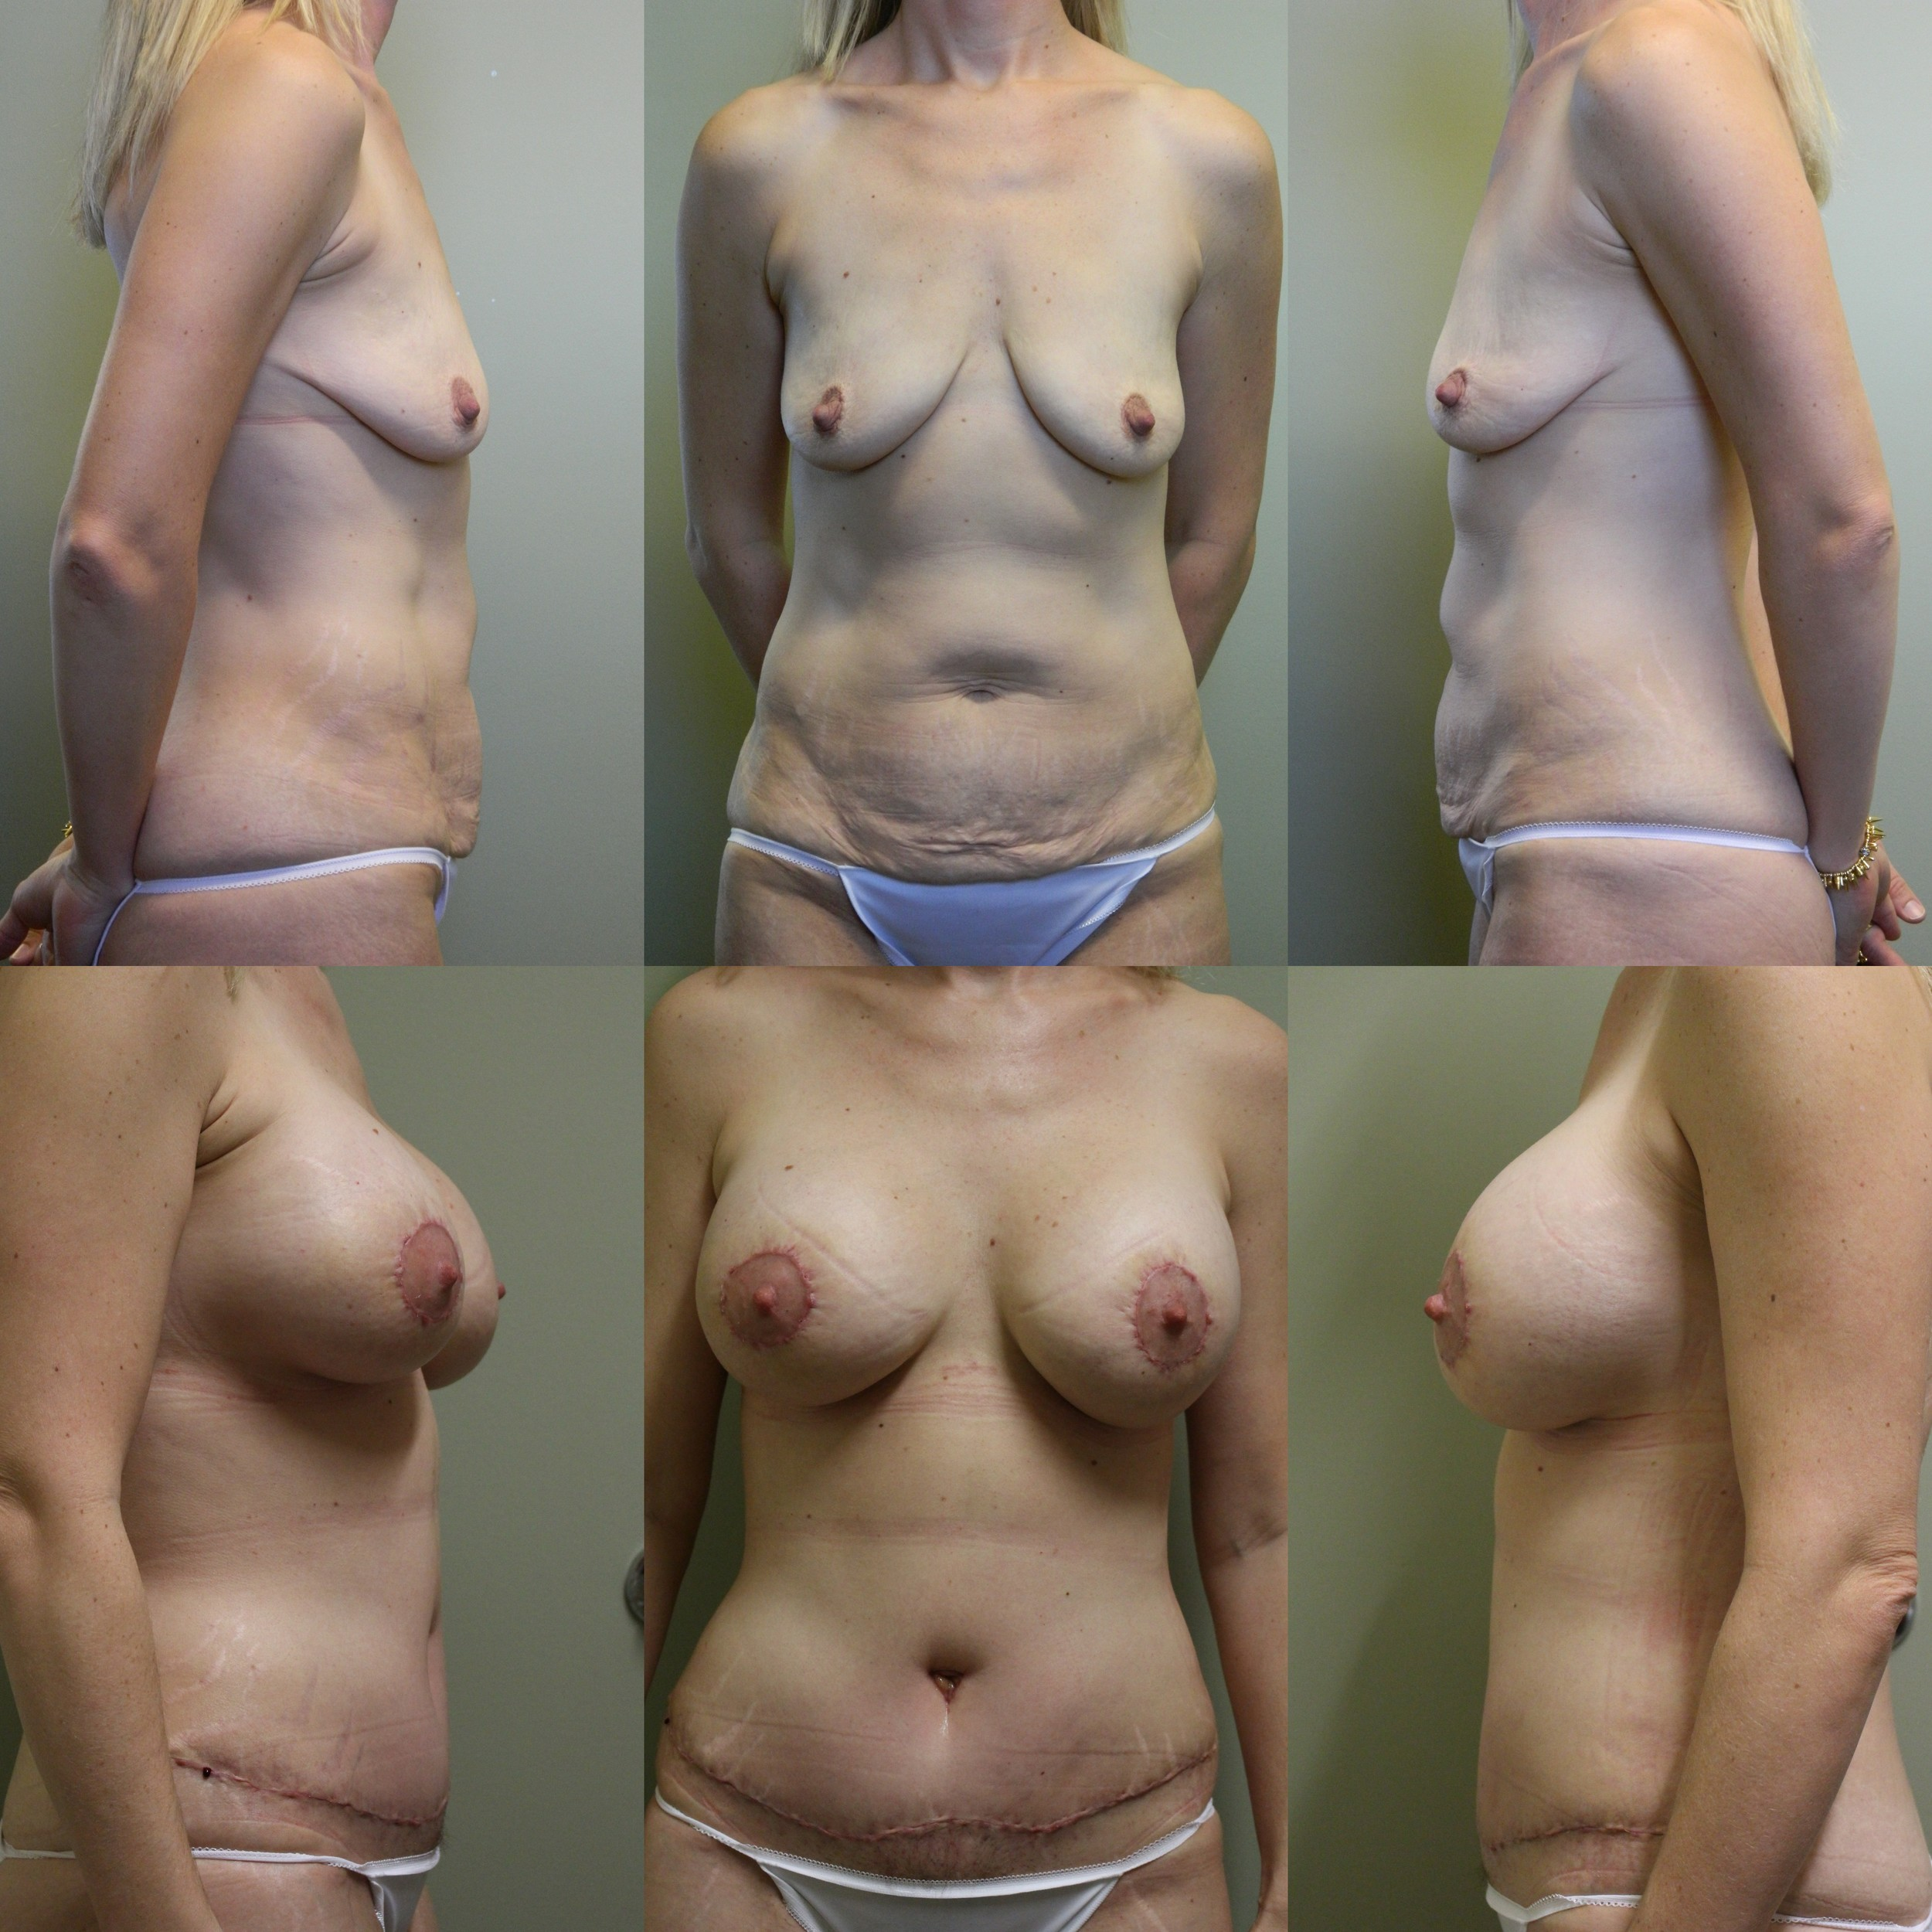 Breast & Body Patient 5